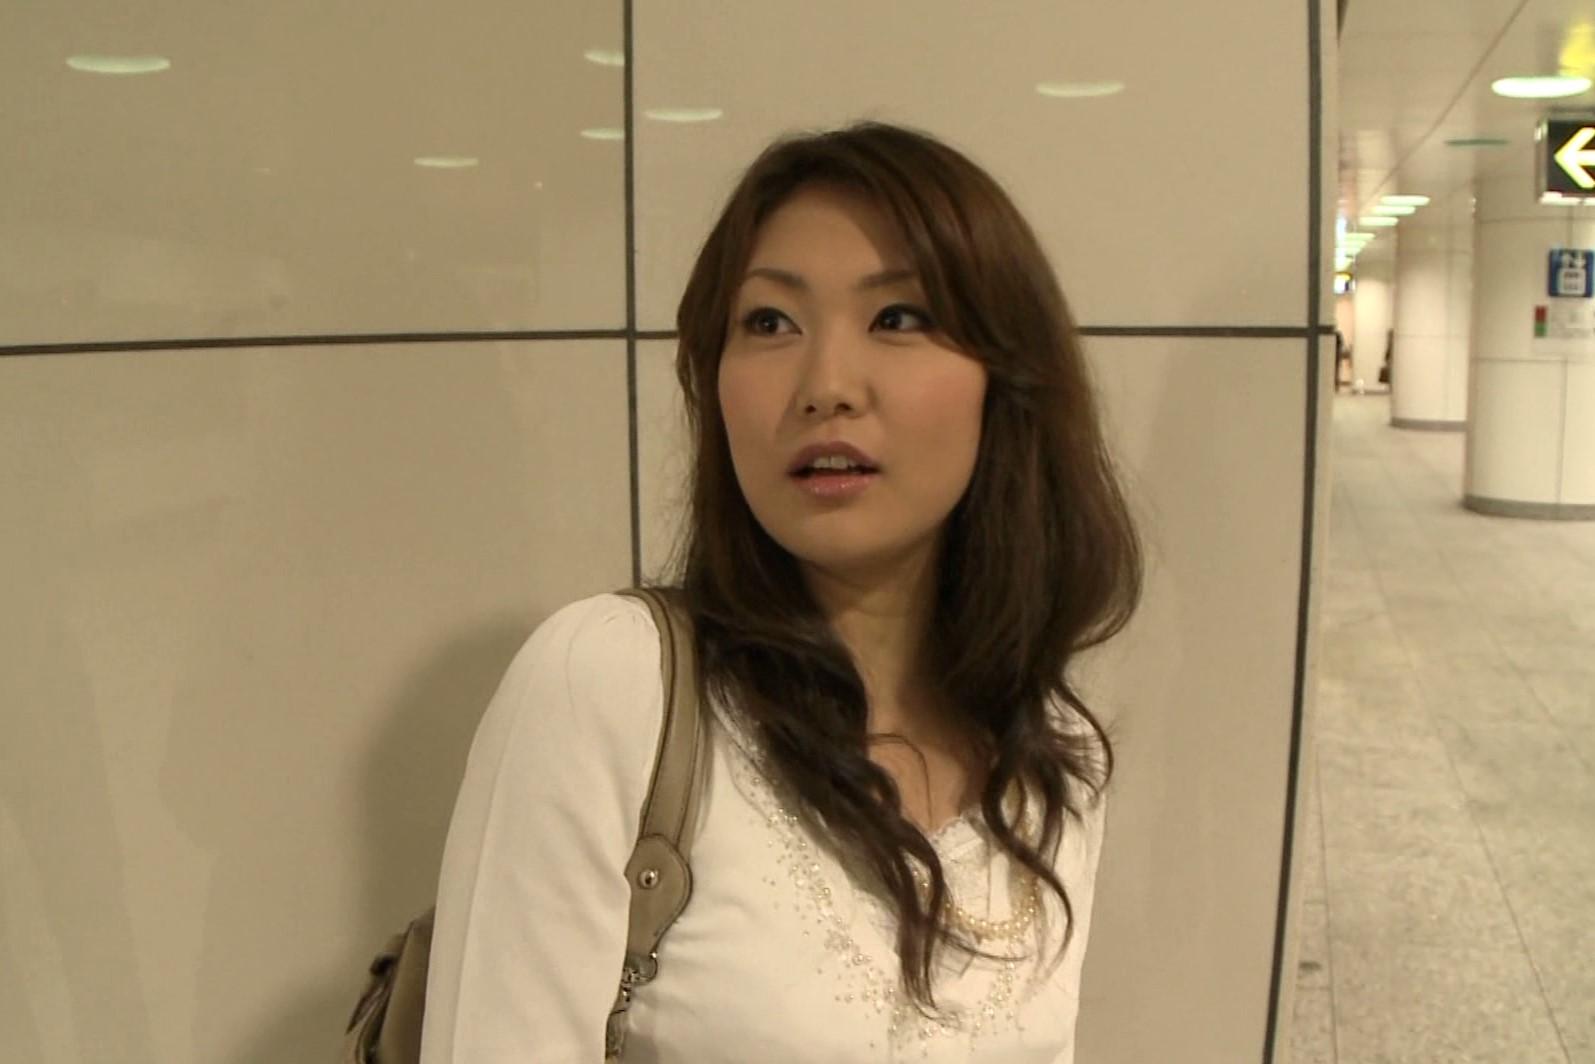 ol bmk1478 01 - 【決定版】出会い系サイト人妻攻略最強マニュアル